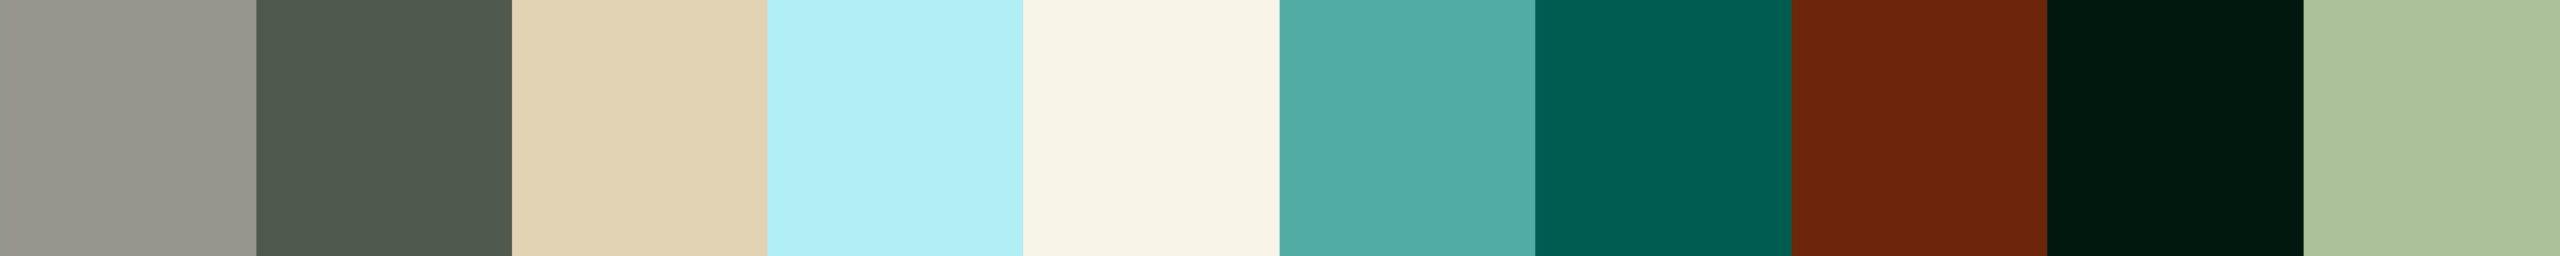 269 Hajadoto Color Palette